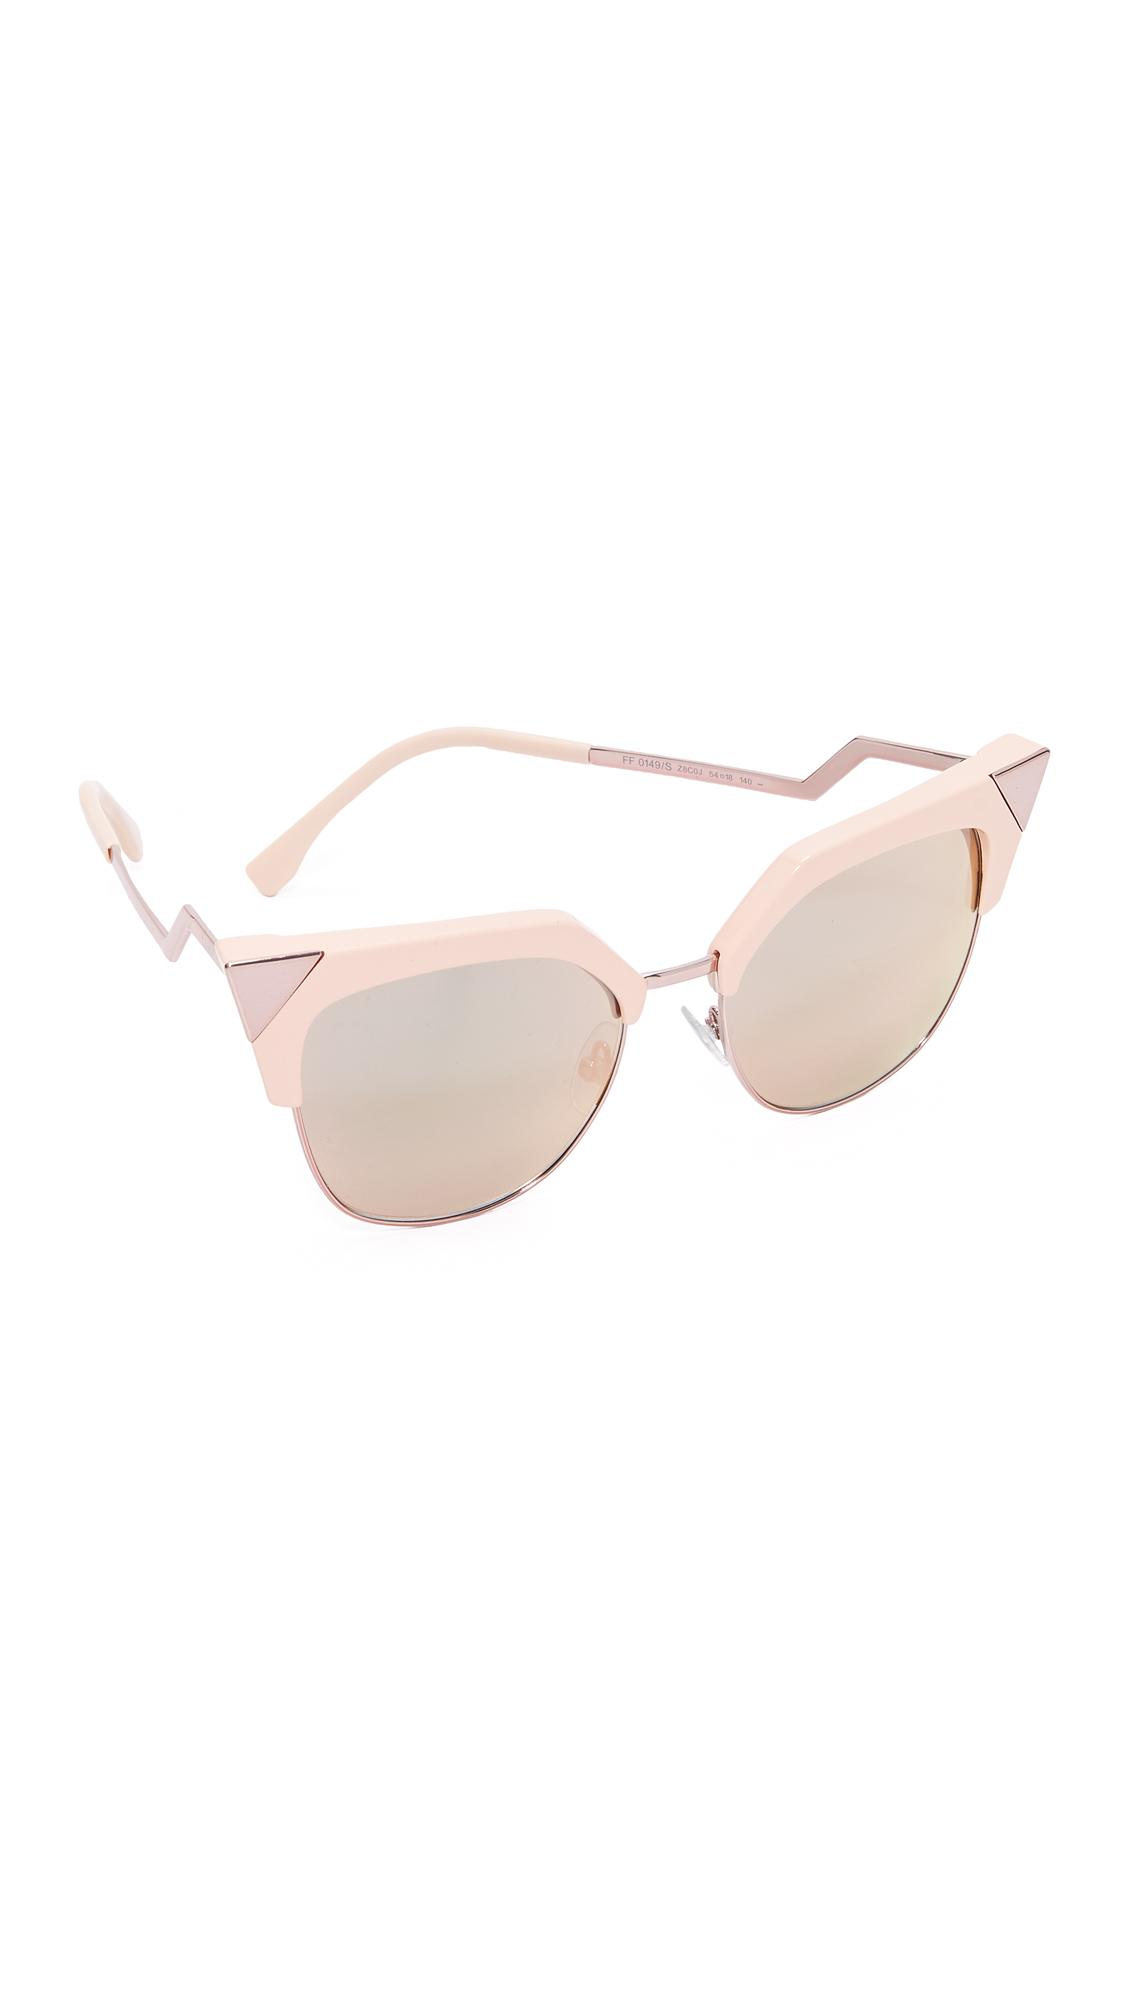 Fendi Iridia Corner Accent Sunglasses - Pink/Rose Gold at Shopbop